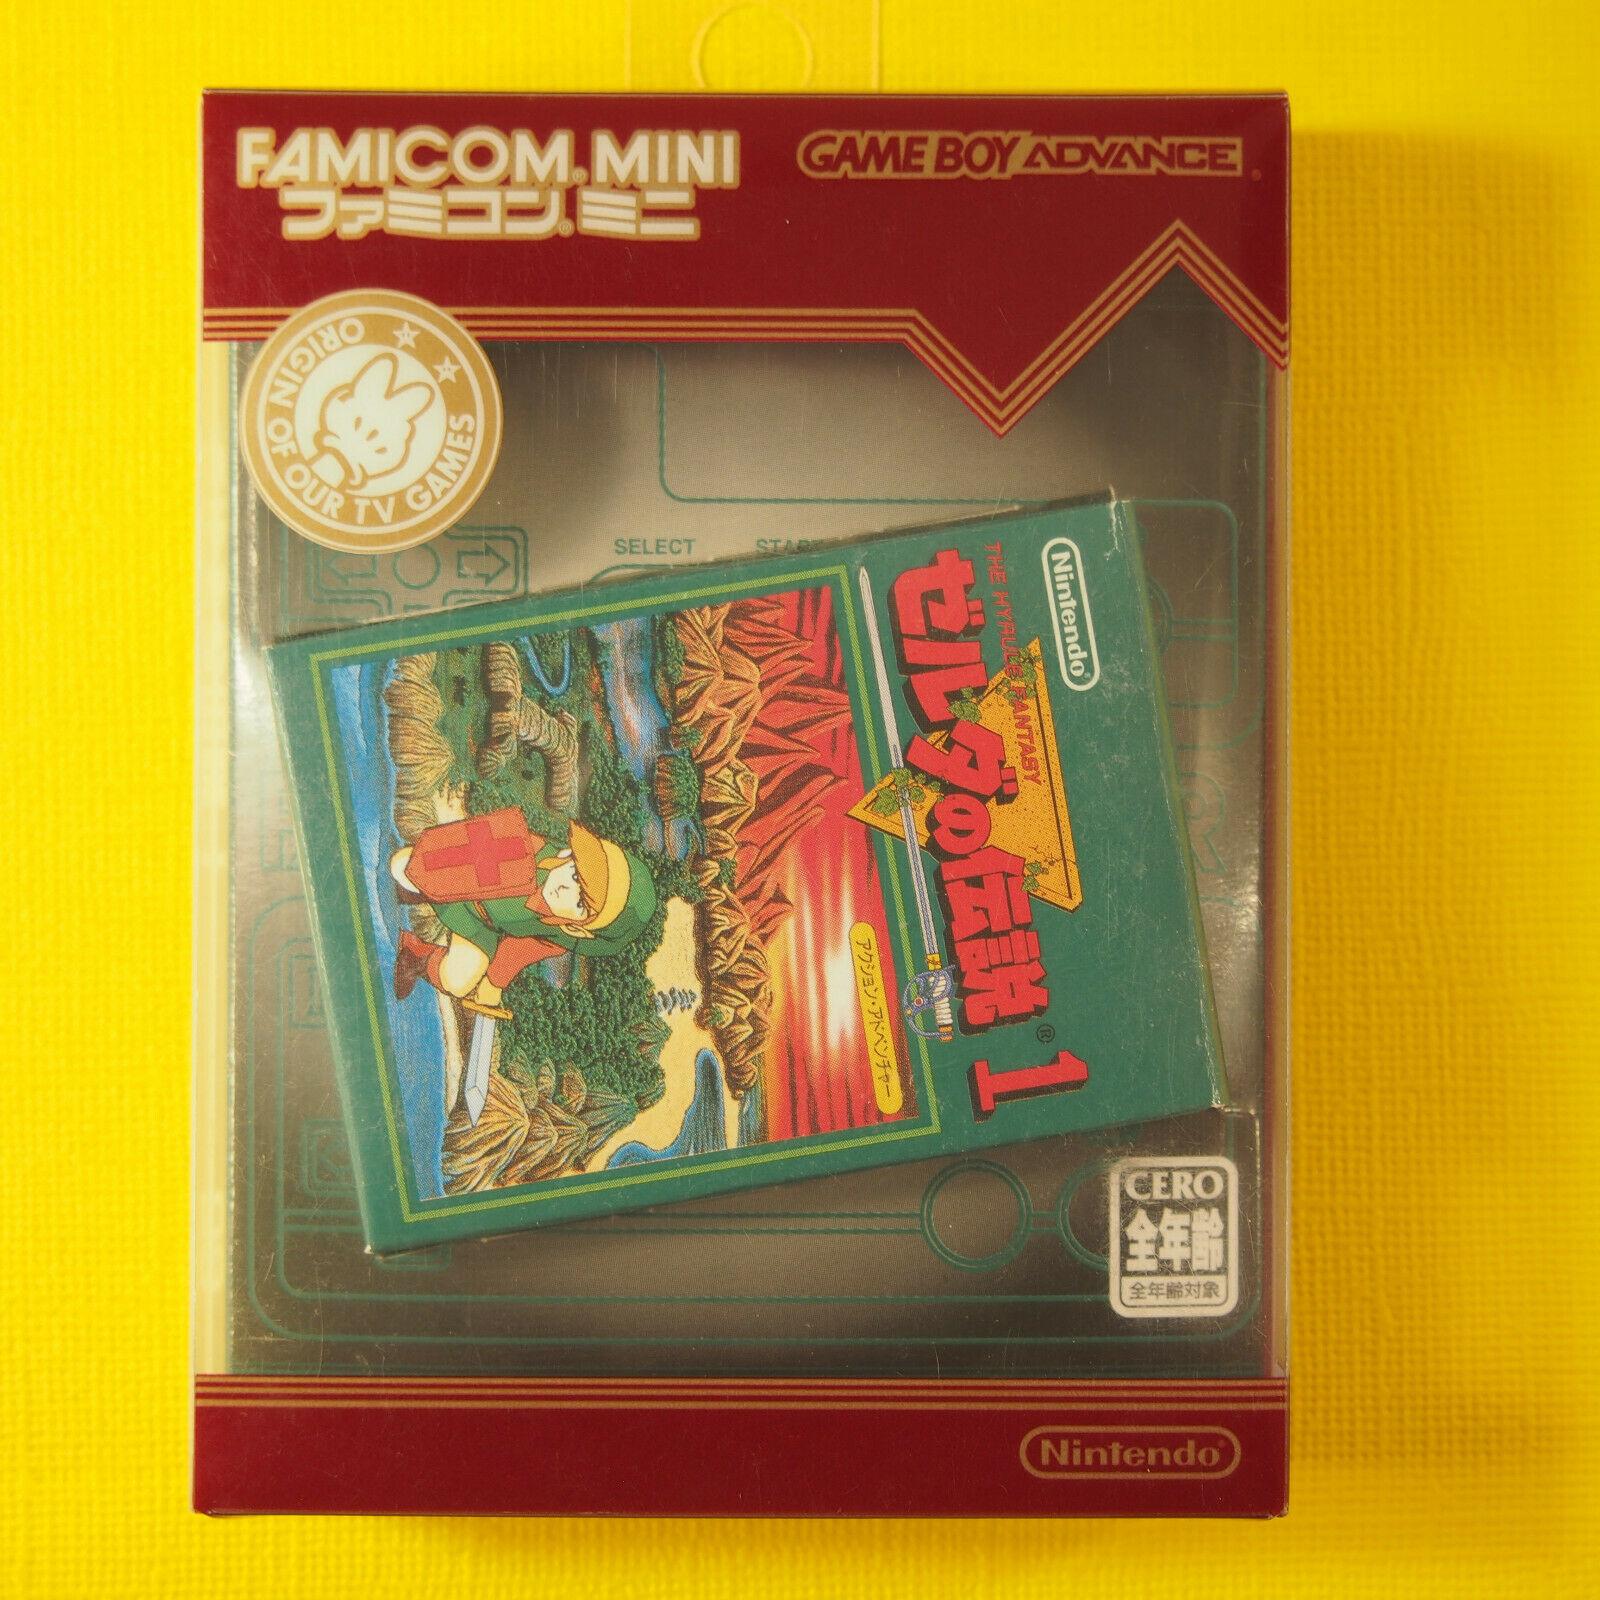 Legend of Zelda: Famicom Mini Complete (Nintendo Gameboy Advance GBA 2004) Japan